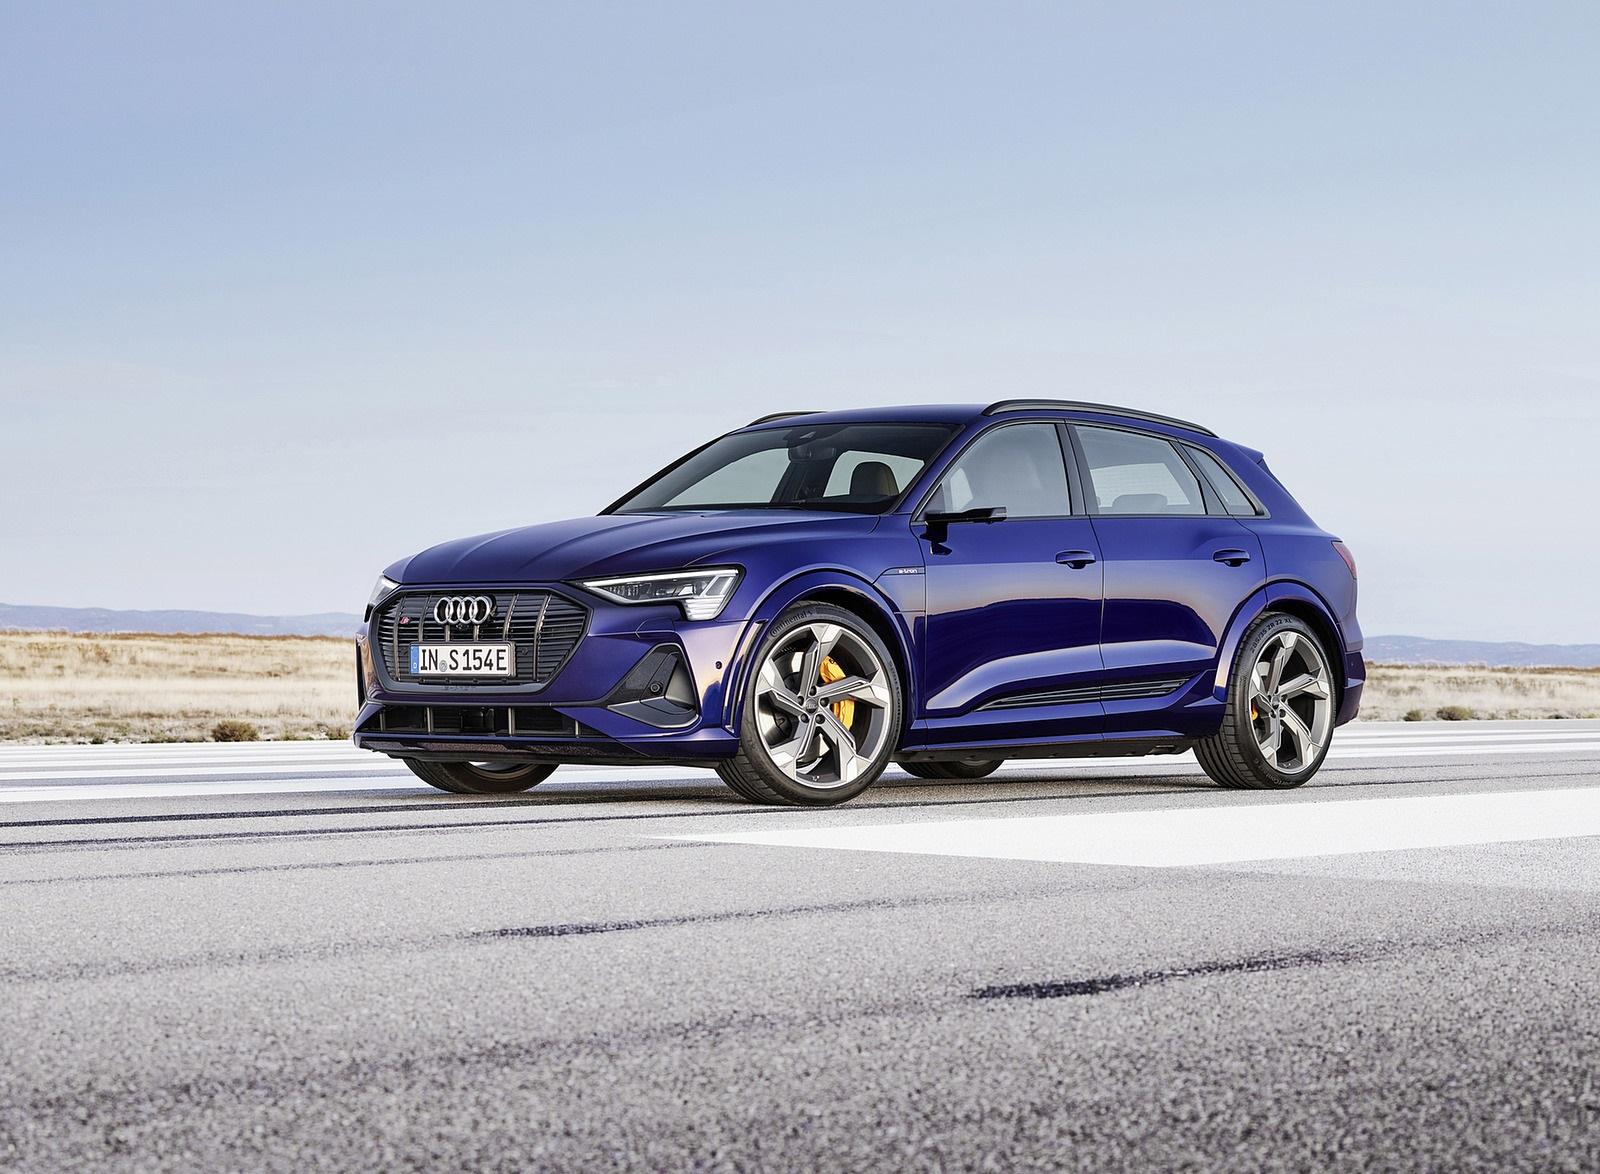 2021 Audi e-tron S (Color: Navarra Blue) Front Three-Quarter Wallpapers (1)